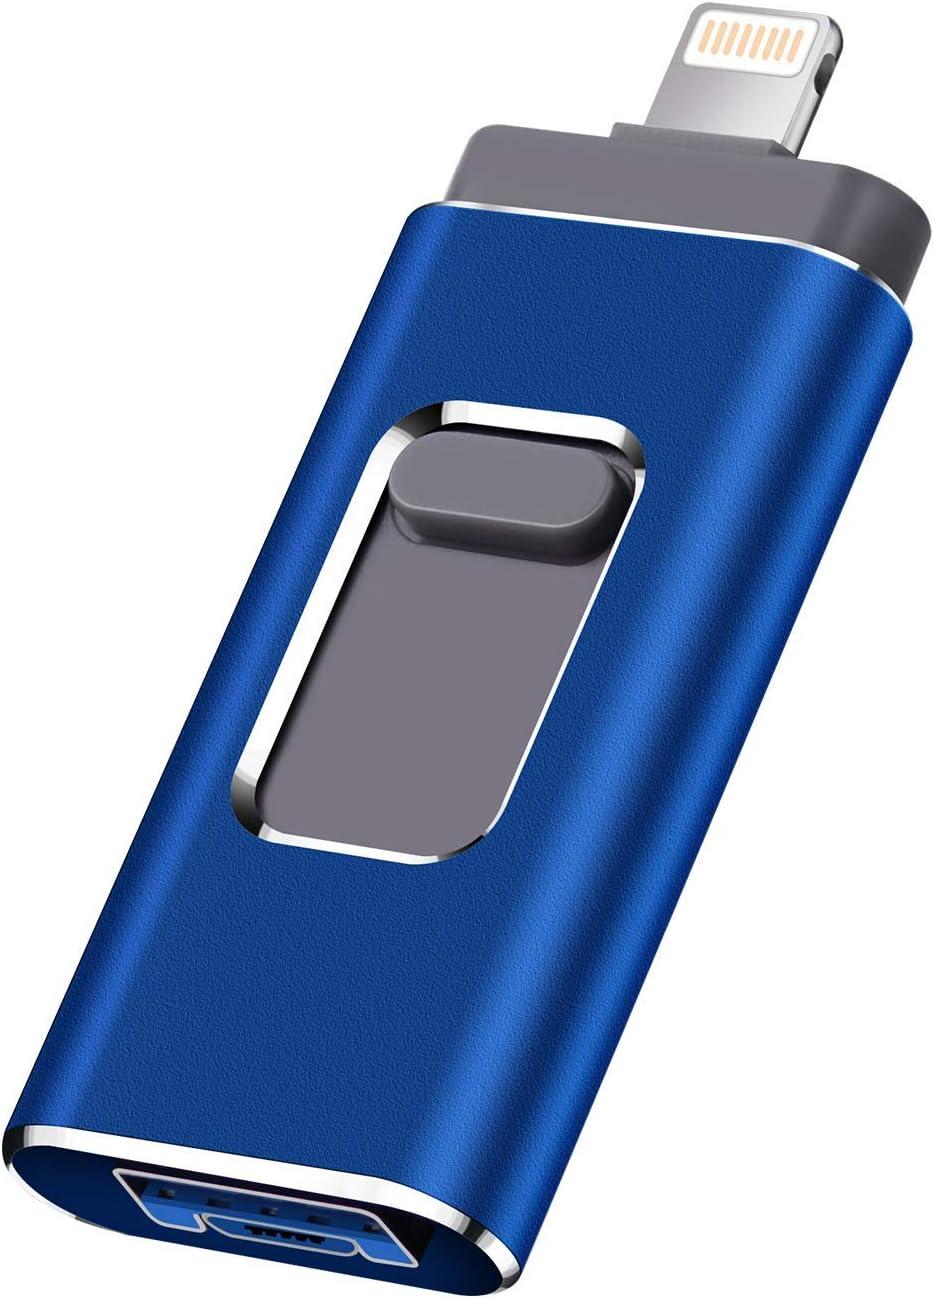 USB Flash Drive for iPhone Photo Stick 1TB Memory Stick USB 3.0 Flash Drive Memory Stick for iPhone and Computers (1TB, Blue)